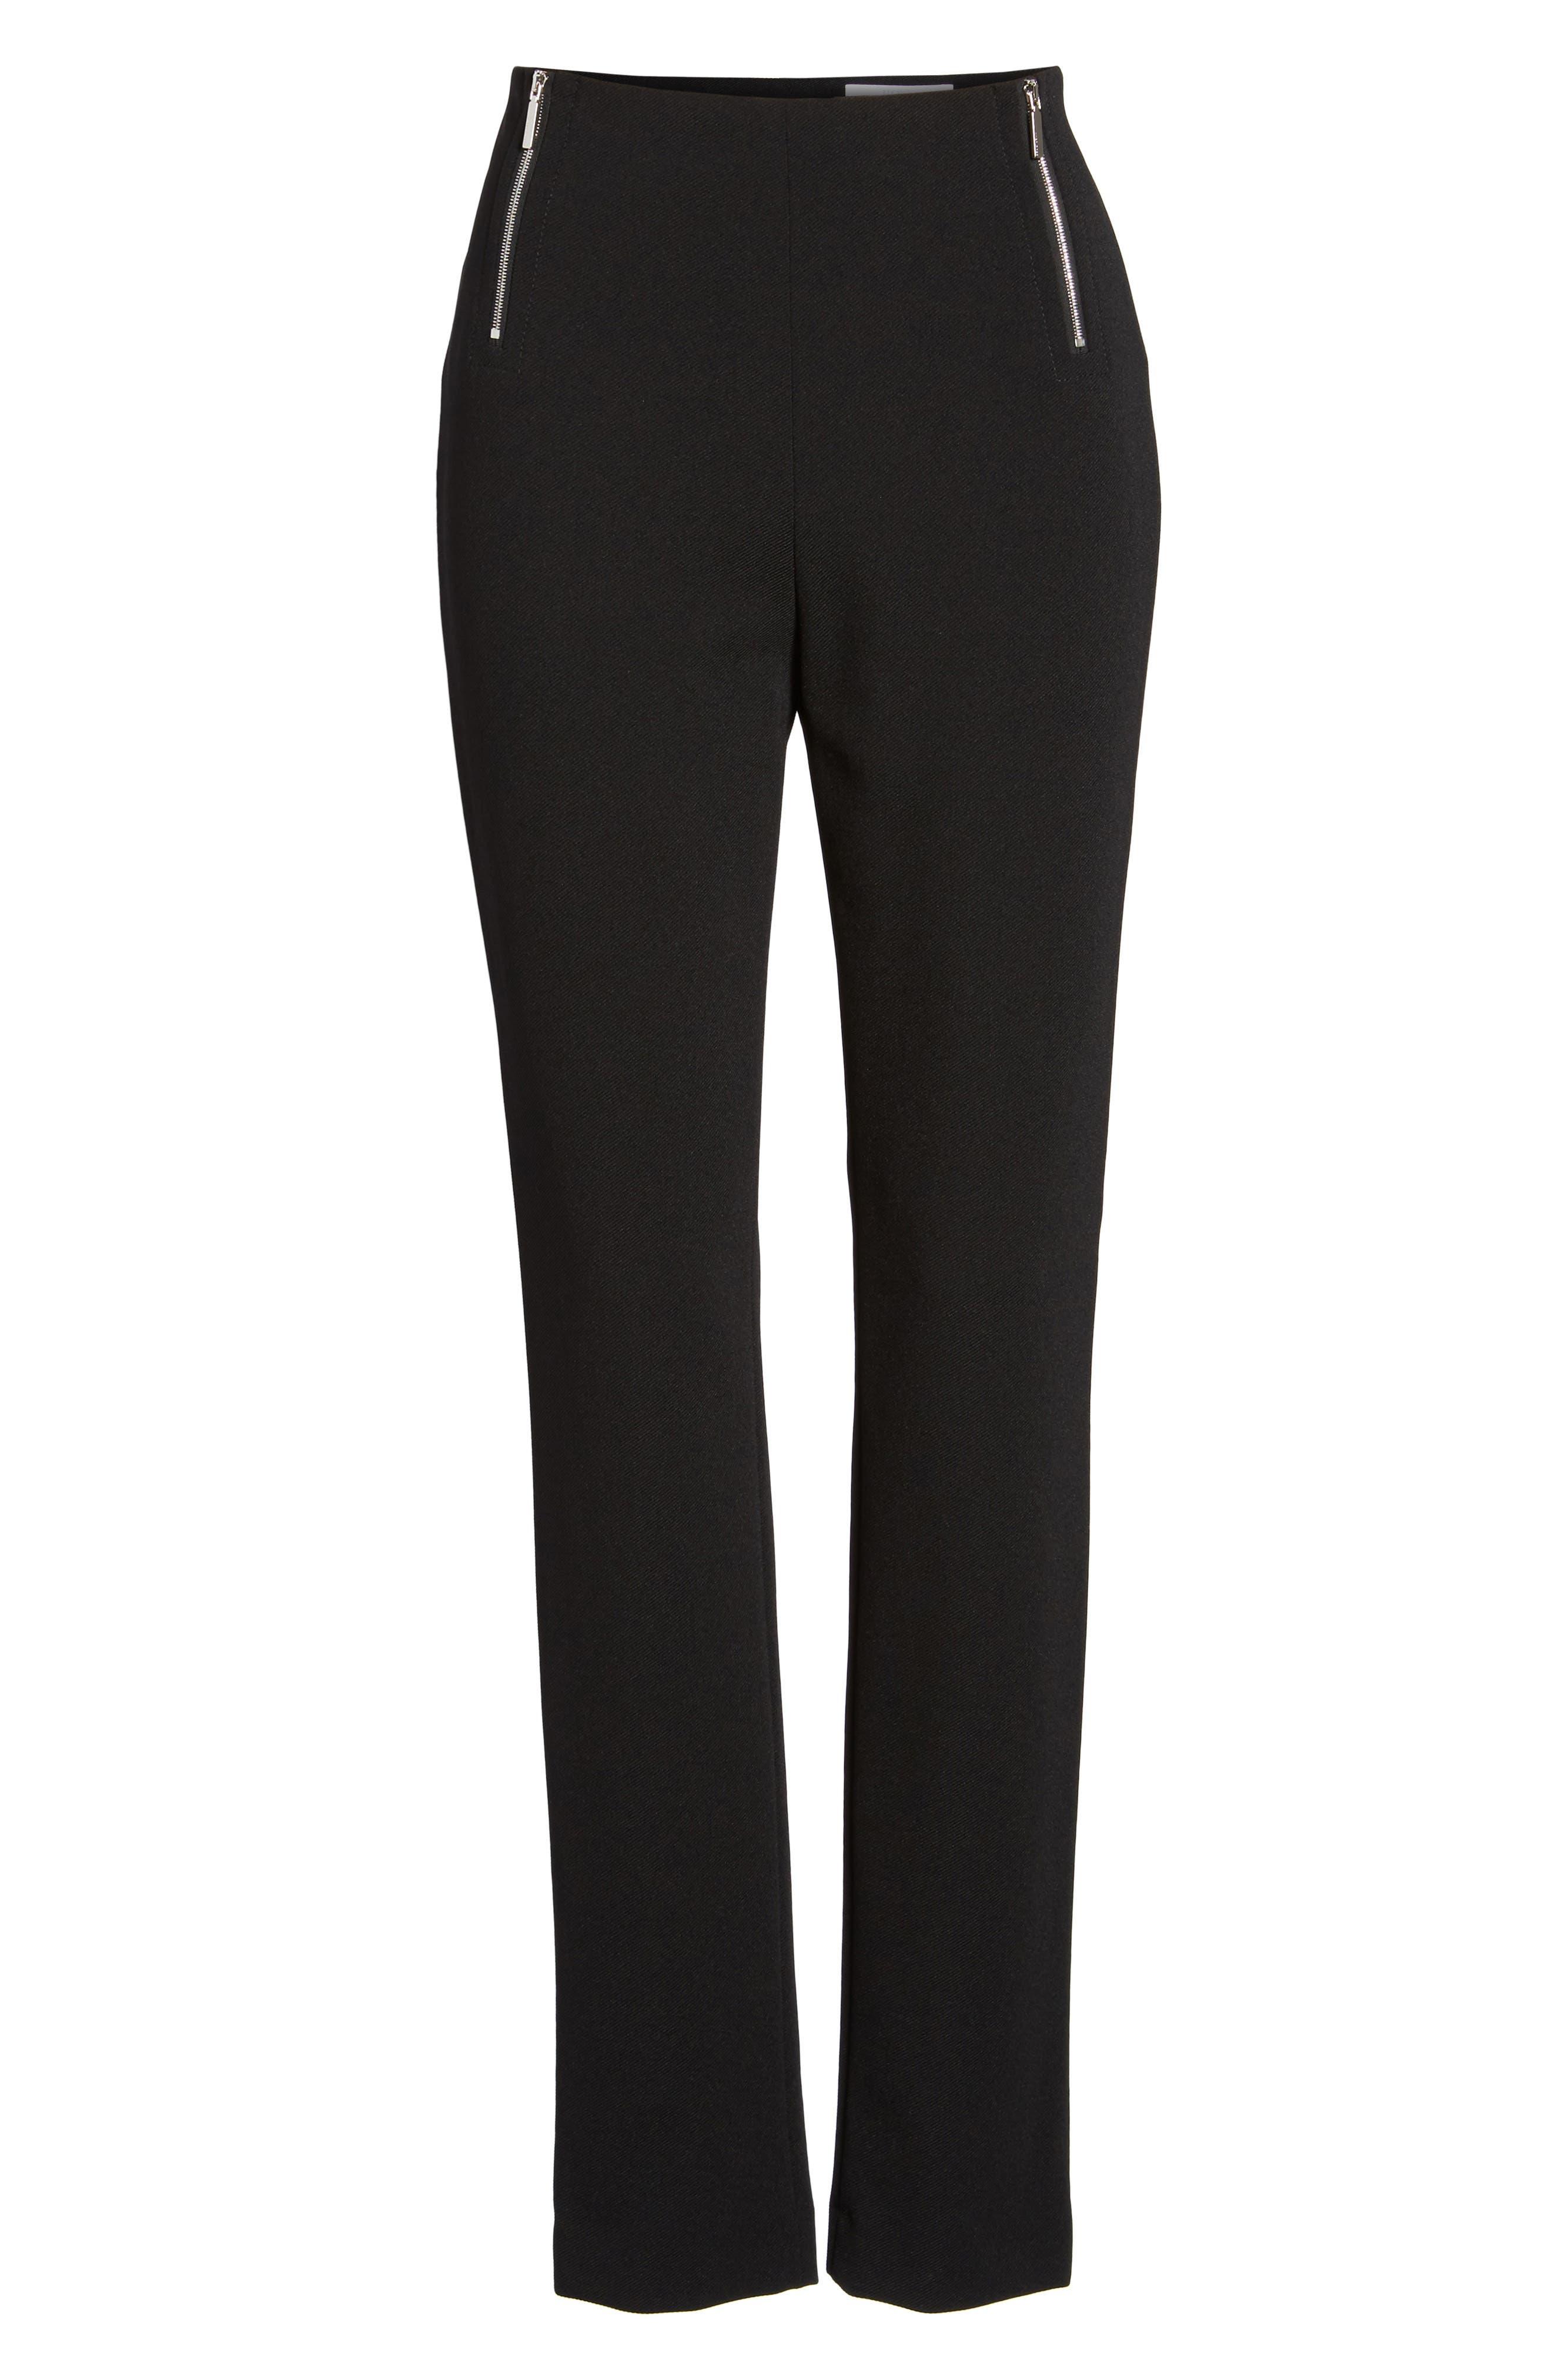 Tilezea Twill Jersey Trousers,                             Alternate thumbnail 7, color,                             Black